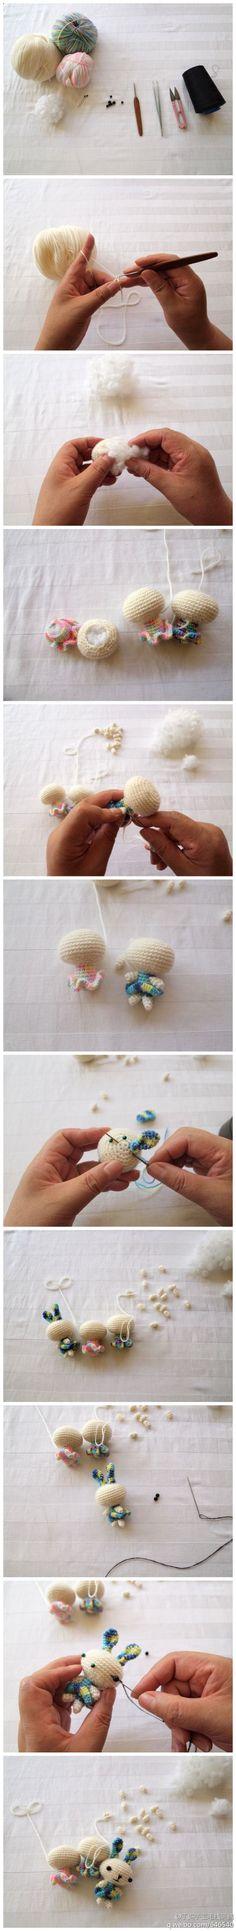 crochet bunnys